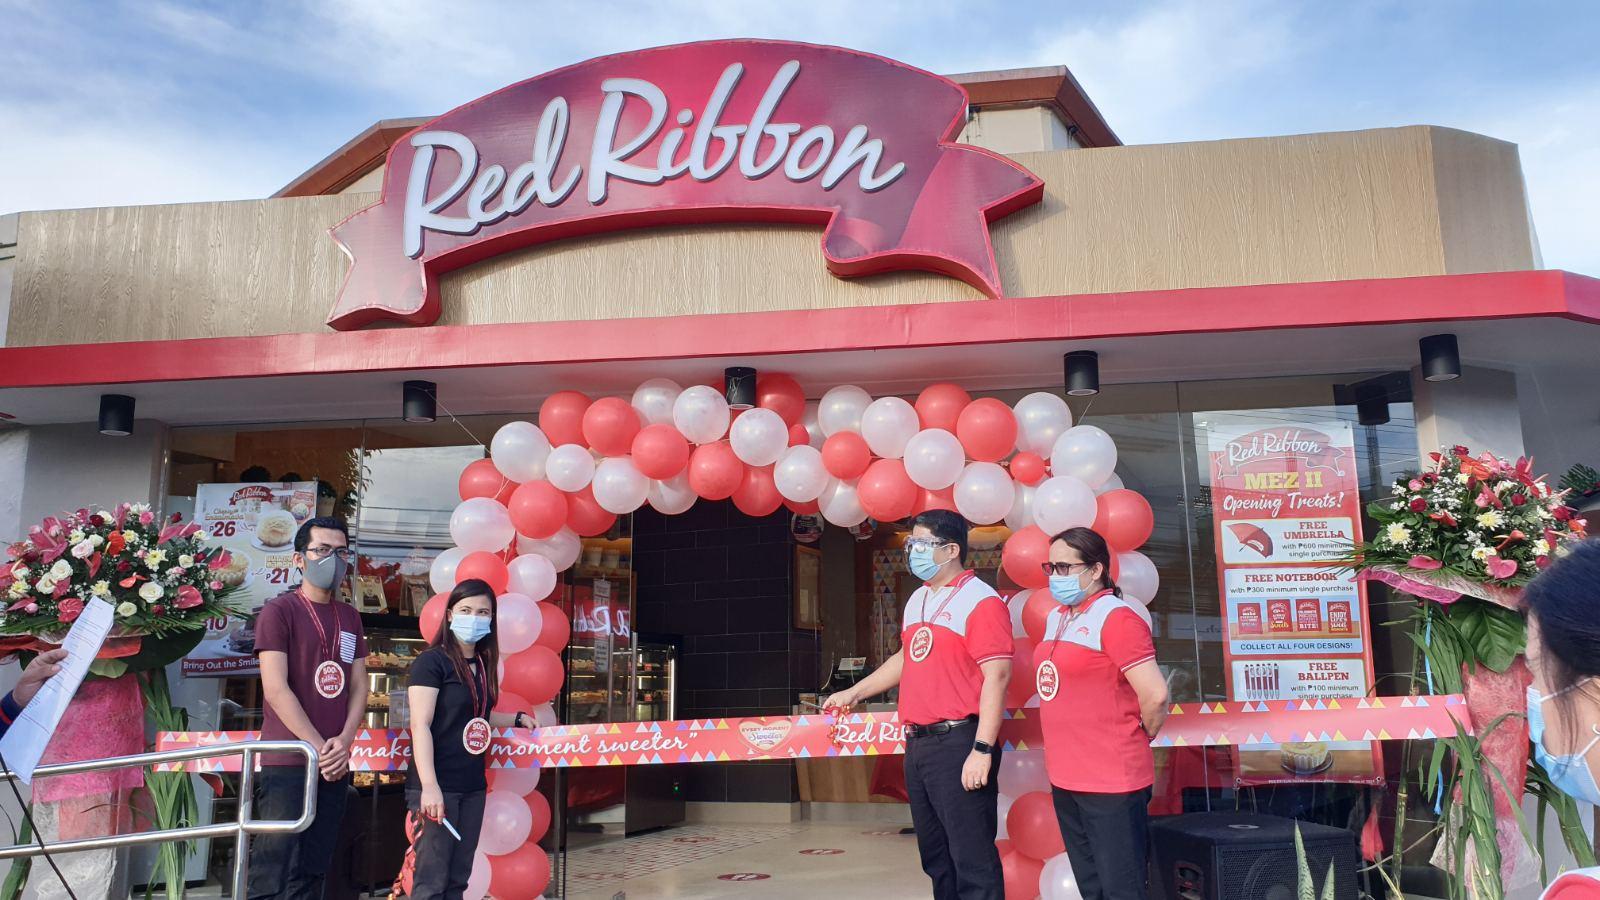 Red Ribbon opens 500TH store in Lapu-Lapu City, Cebu